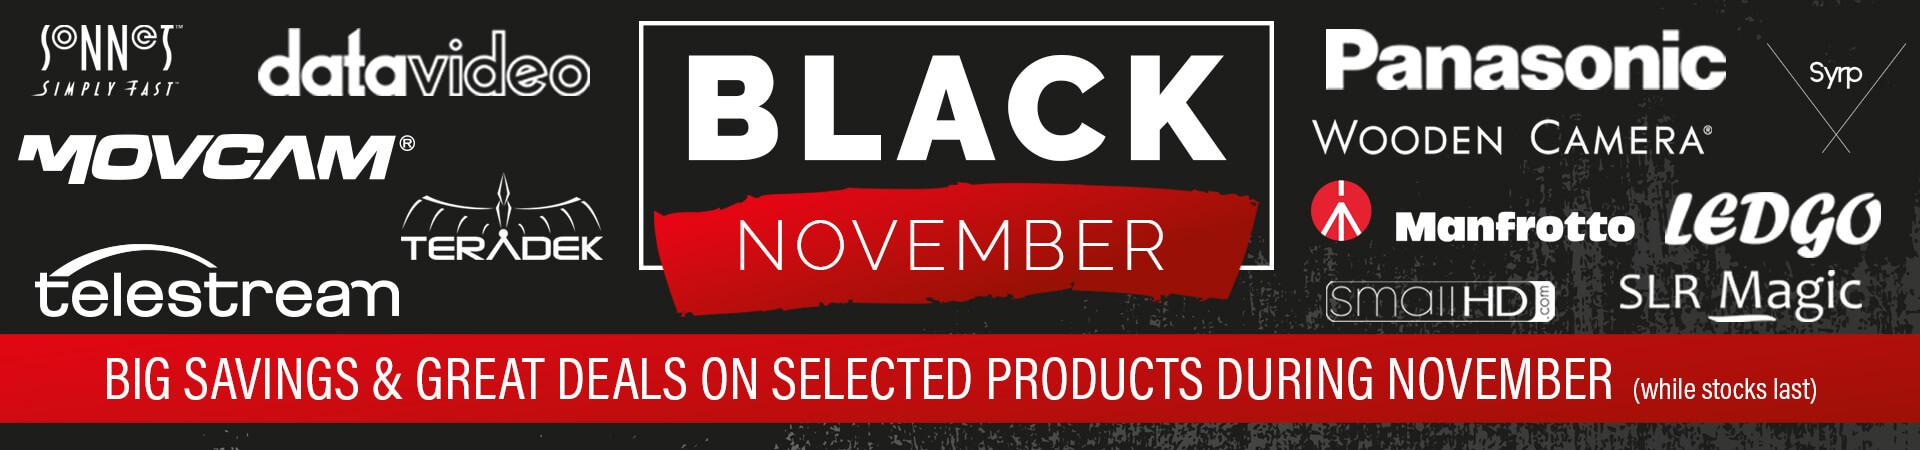 Black November - Launch 3